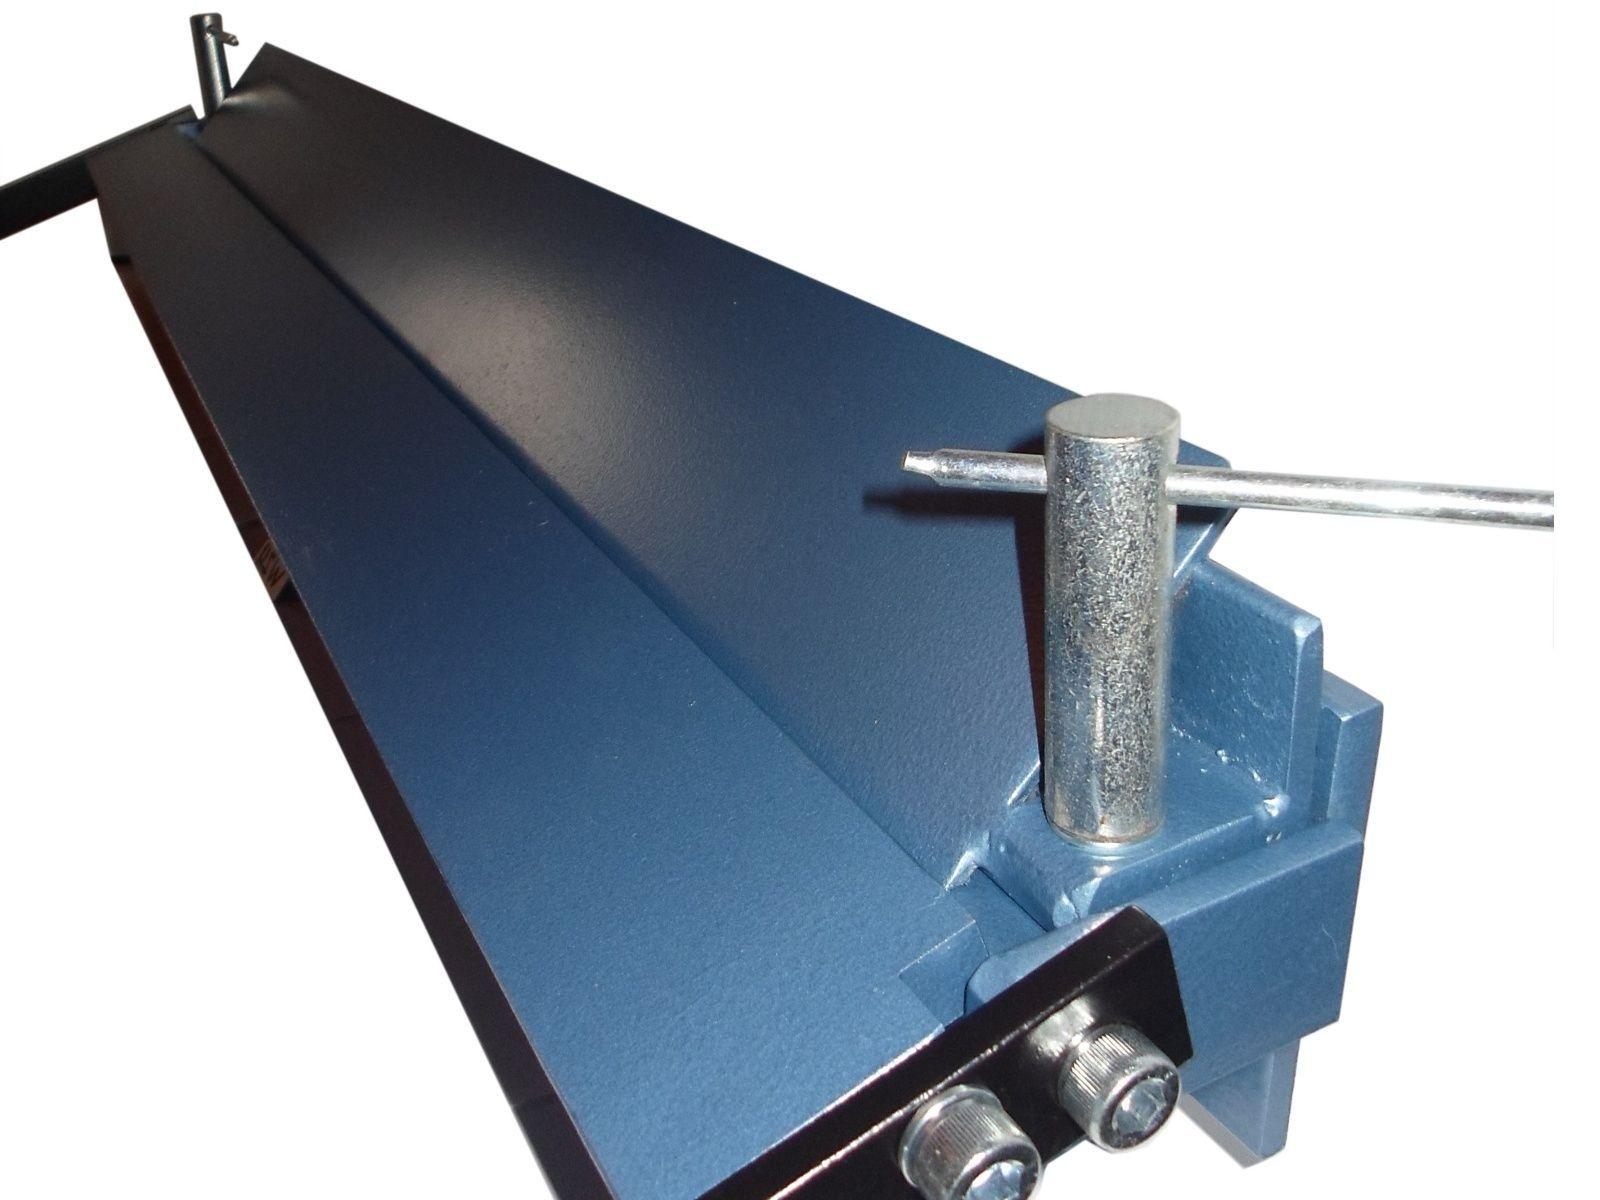 Bending Tool Is Designed For Bending Sheet Steel Sheet Metal Ferrous Metals And Other Flexible Material Sheet Metal Brake Metal Fabrication Tools Sheet Metal